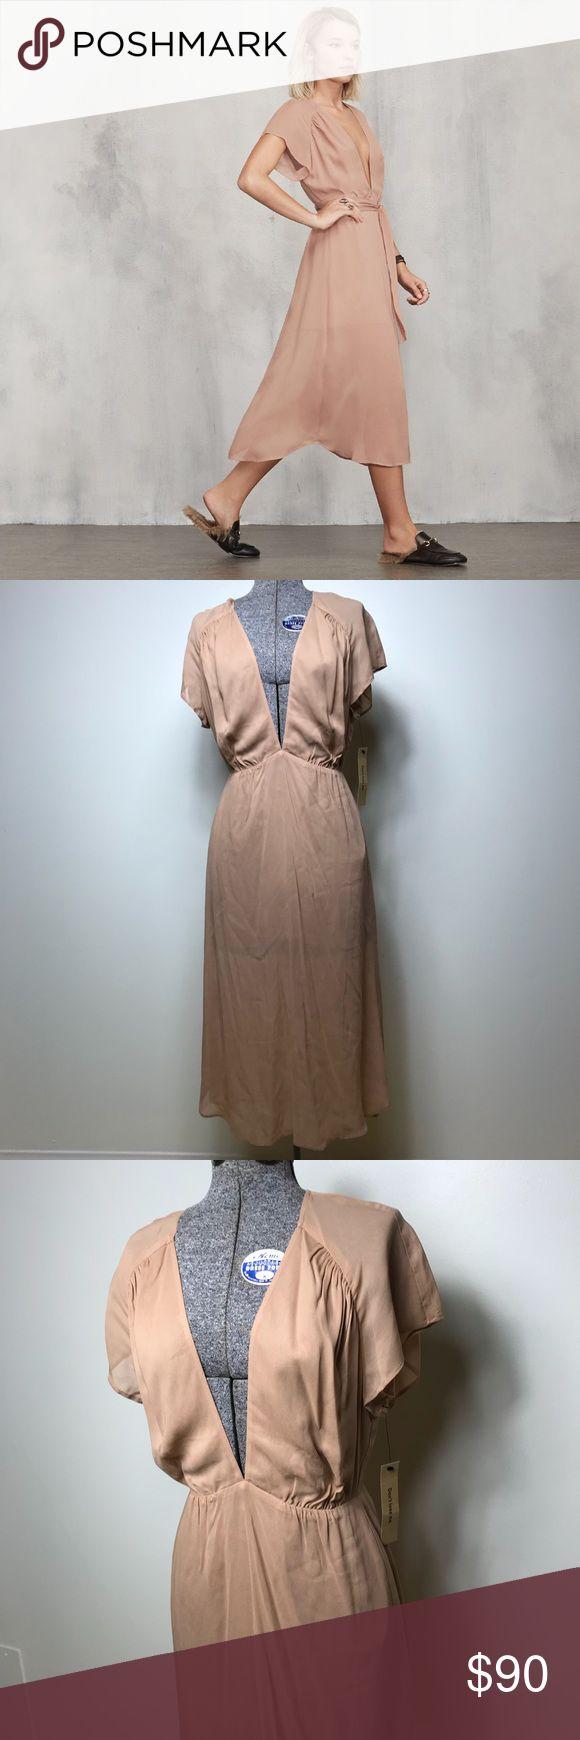 NWT REFORMATION THALIA PETITE DRESS NWT Reformation petite beige Thalia dress. Does not come with sash/belt. Reformation Dresses